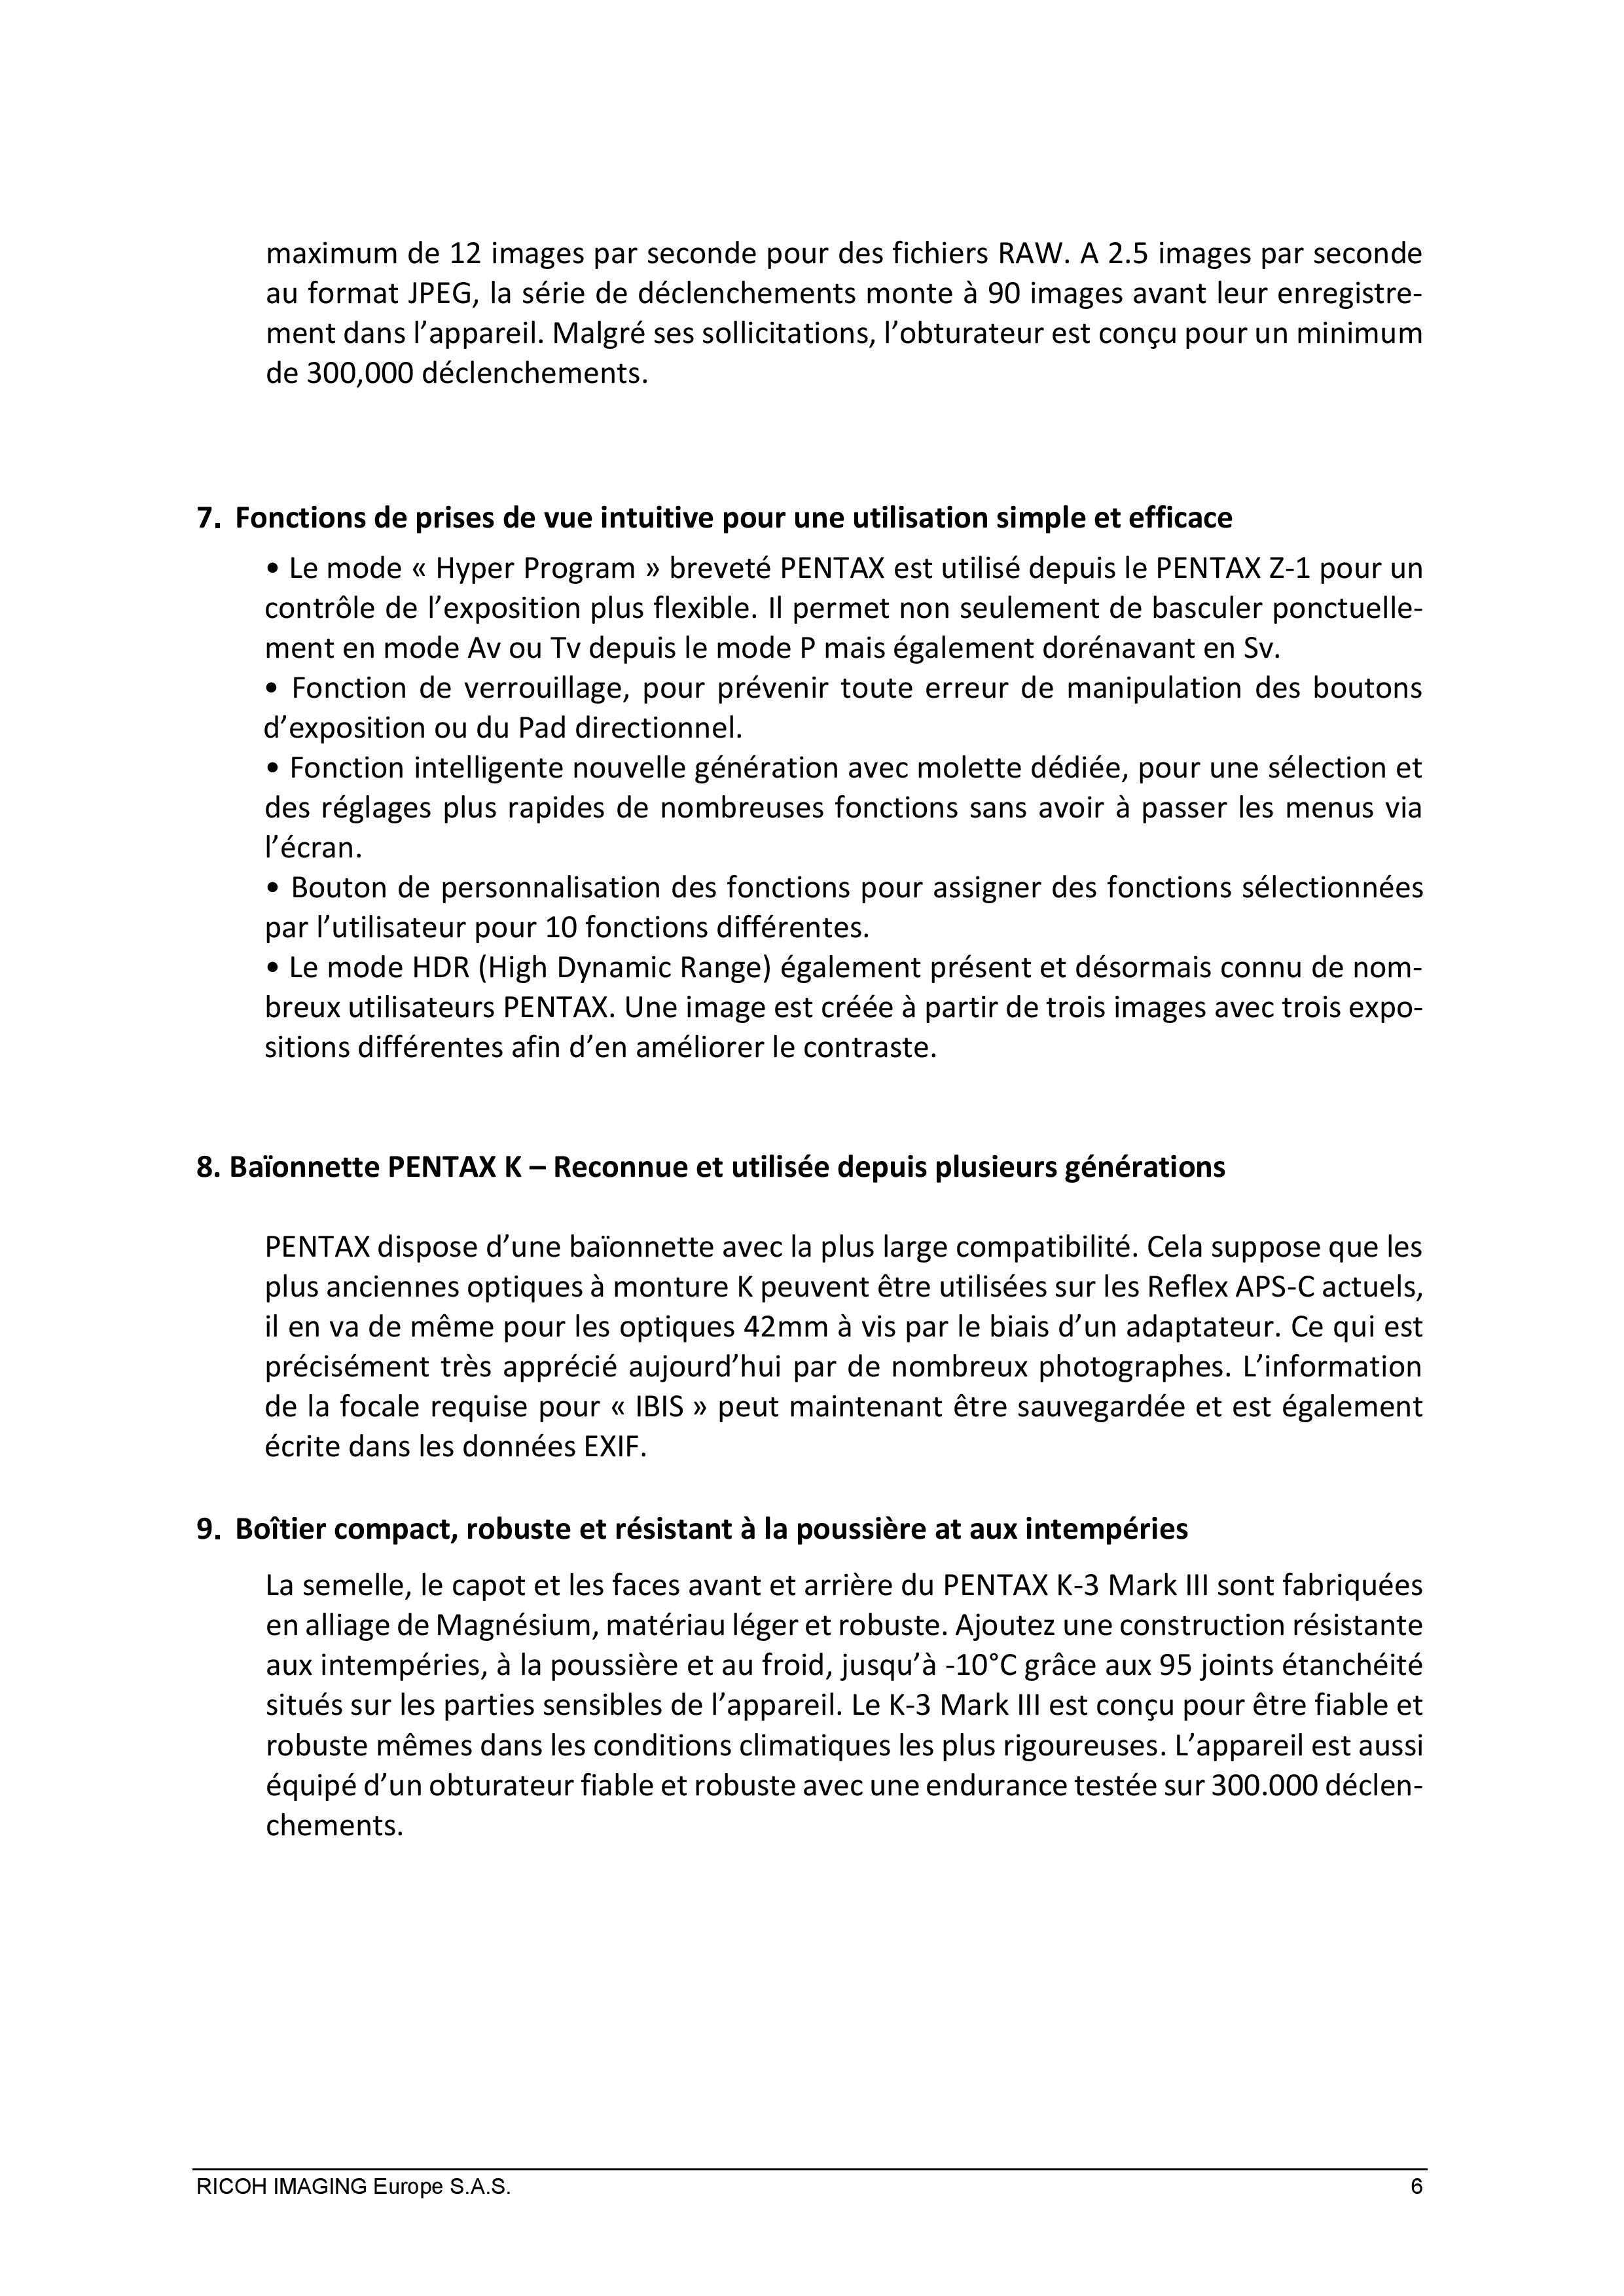 PENTAX RICOH IMAGING - Communiqué de presse du K3 Mark III 21033103151823142217344192